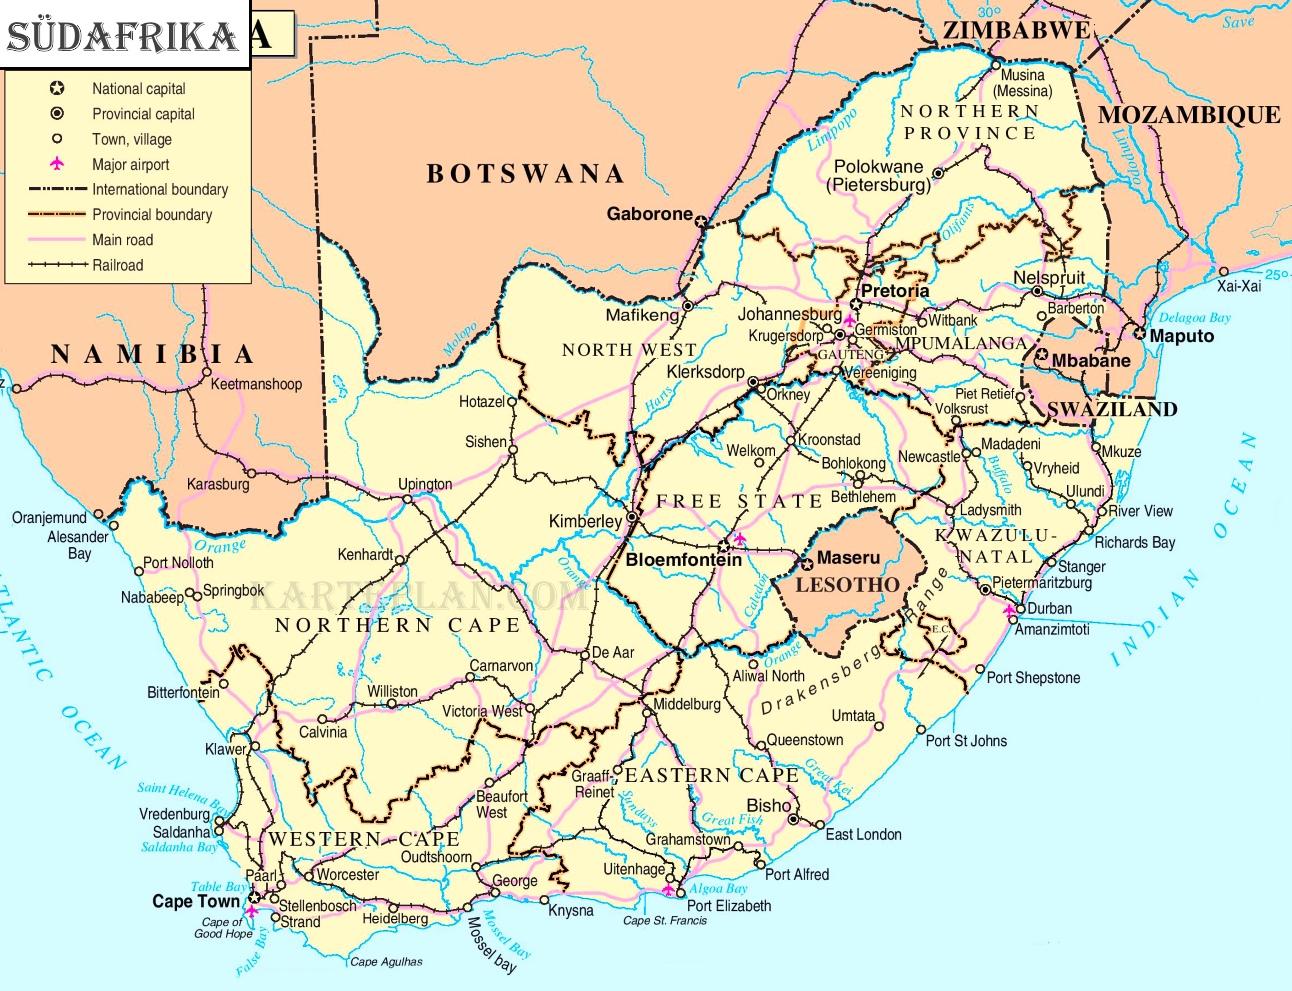 Sudafrika Politische Karte